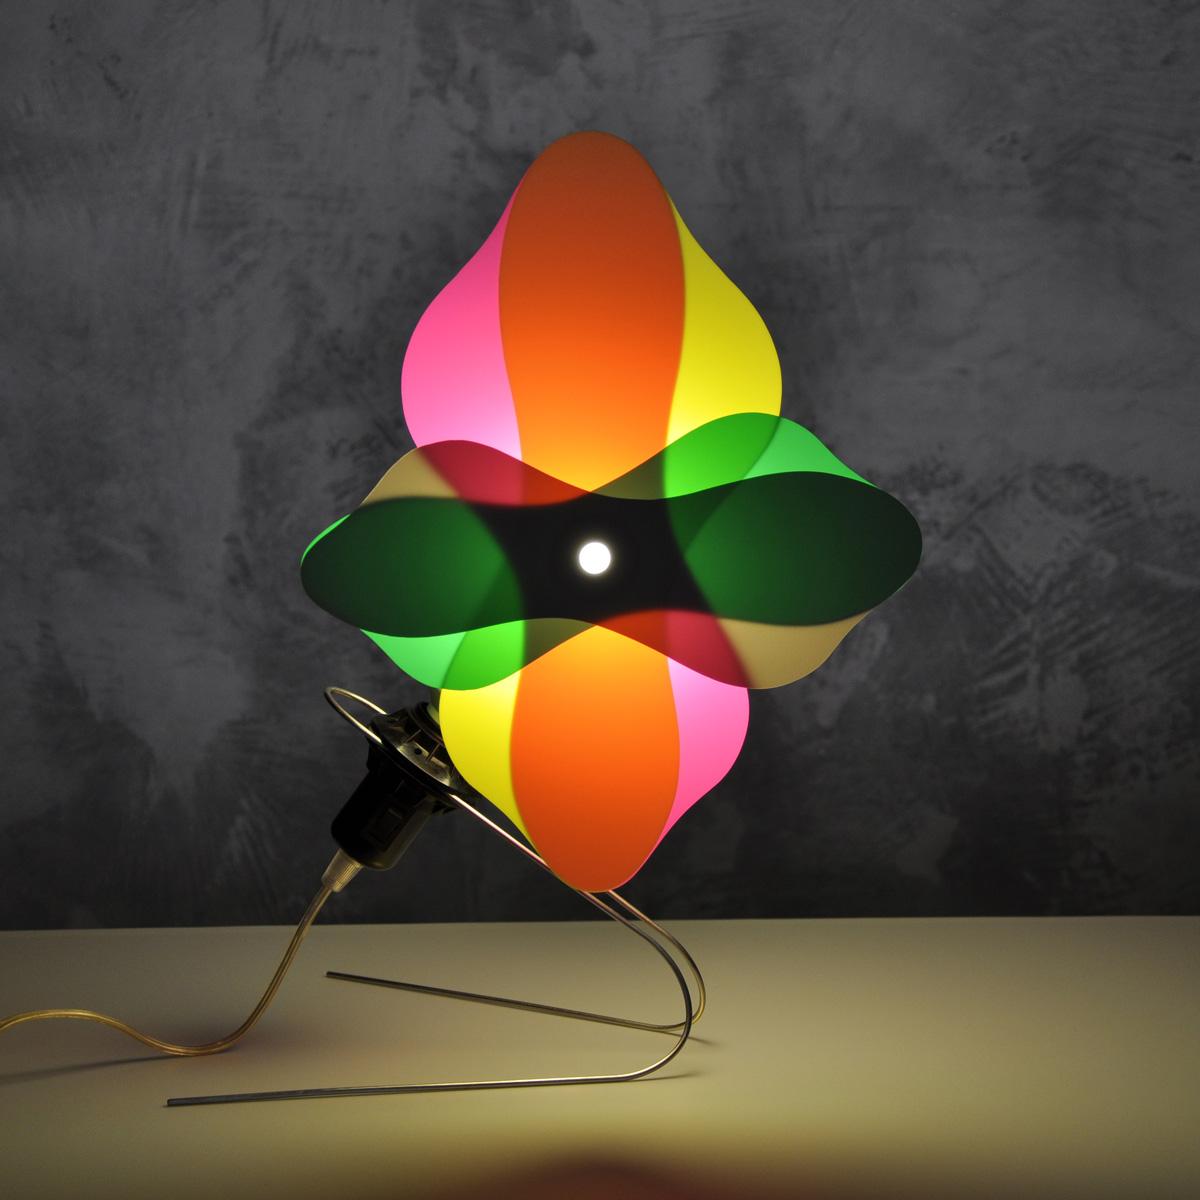 Freydenberg_Trans_Flower_Butterfly_10.jpg